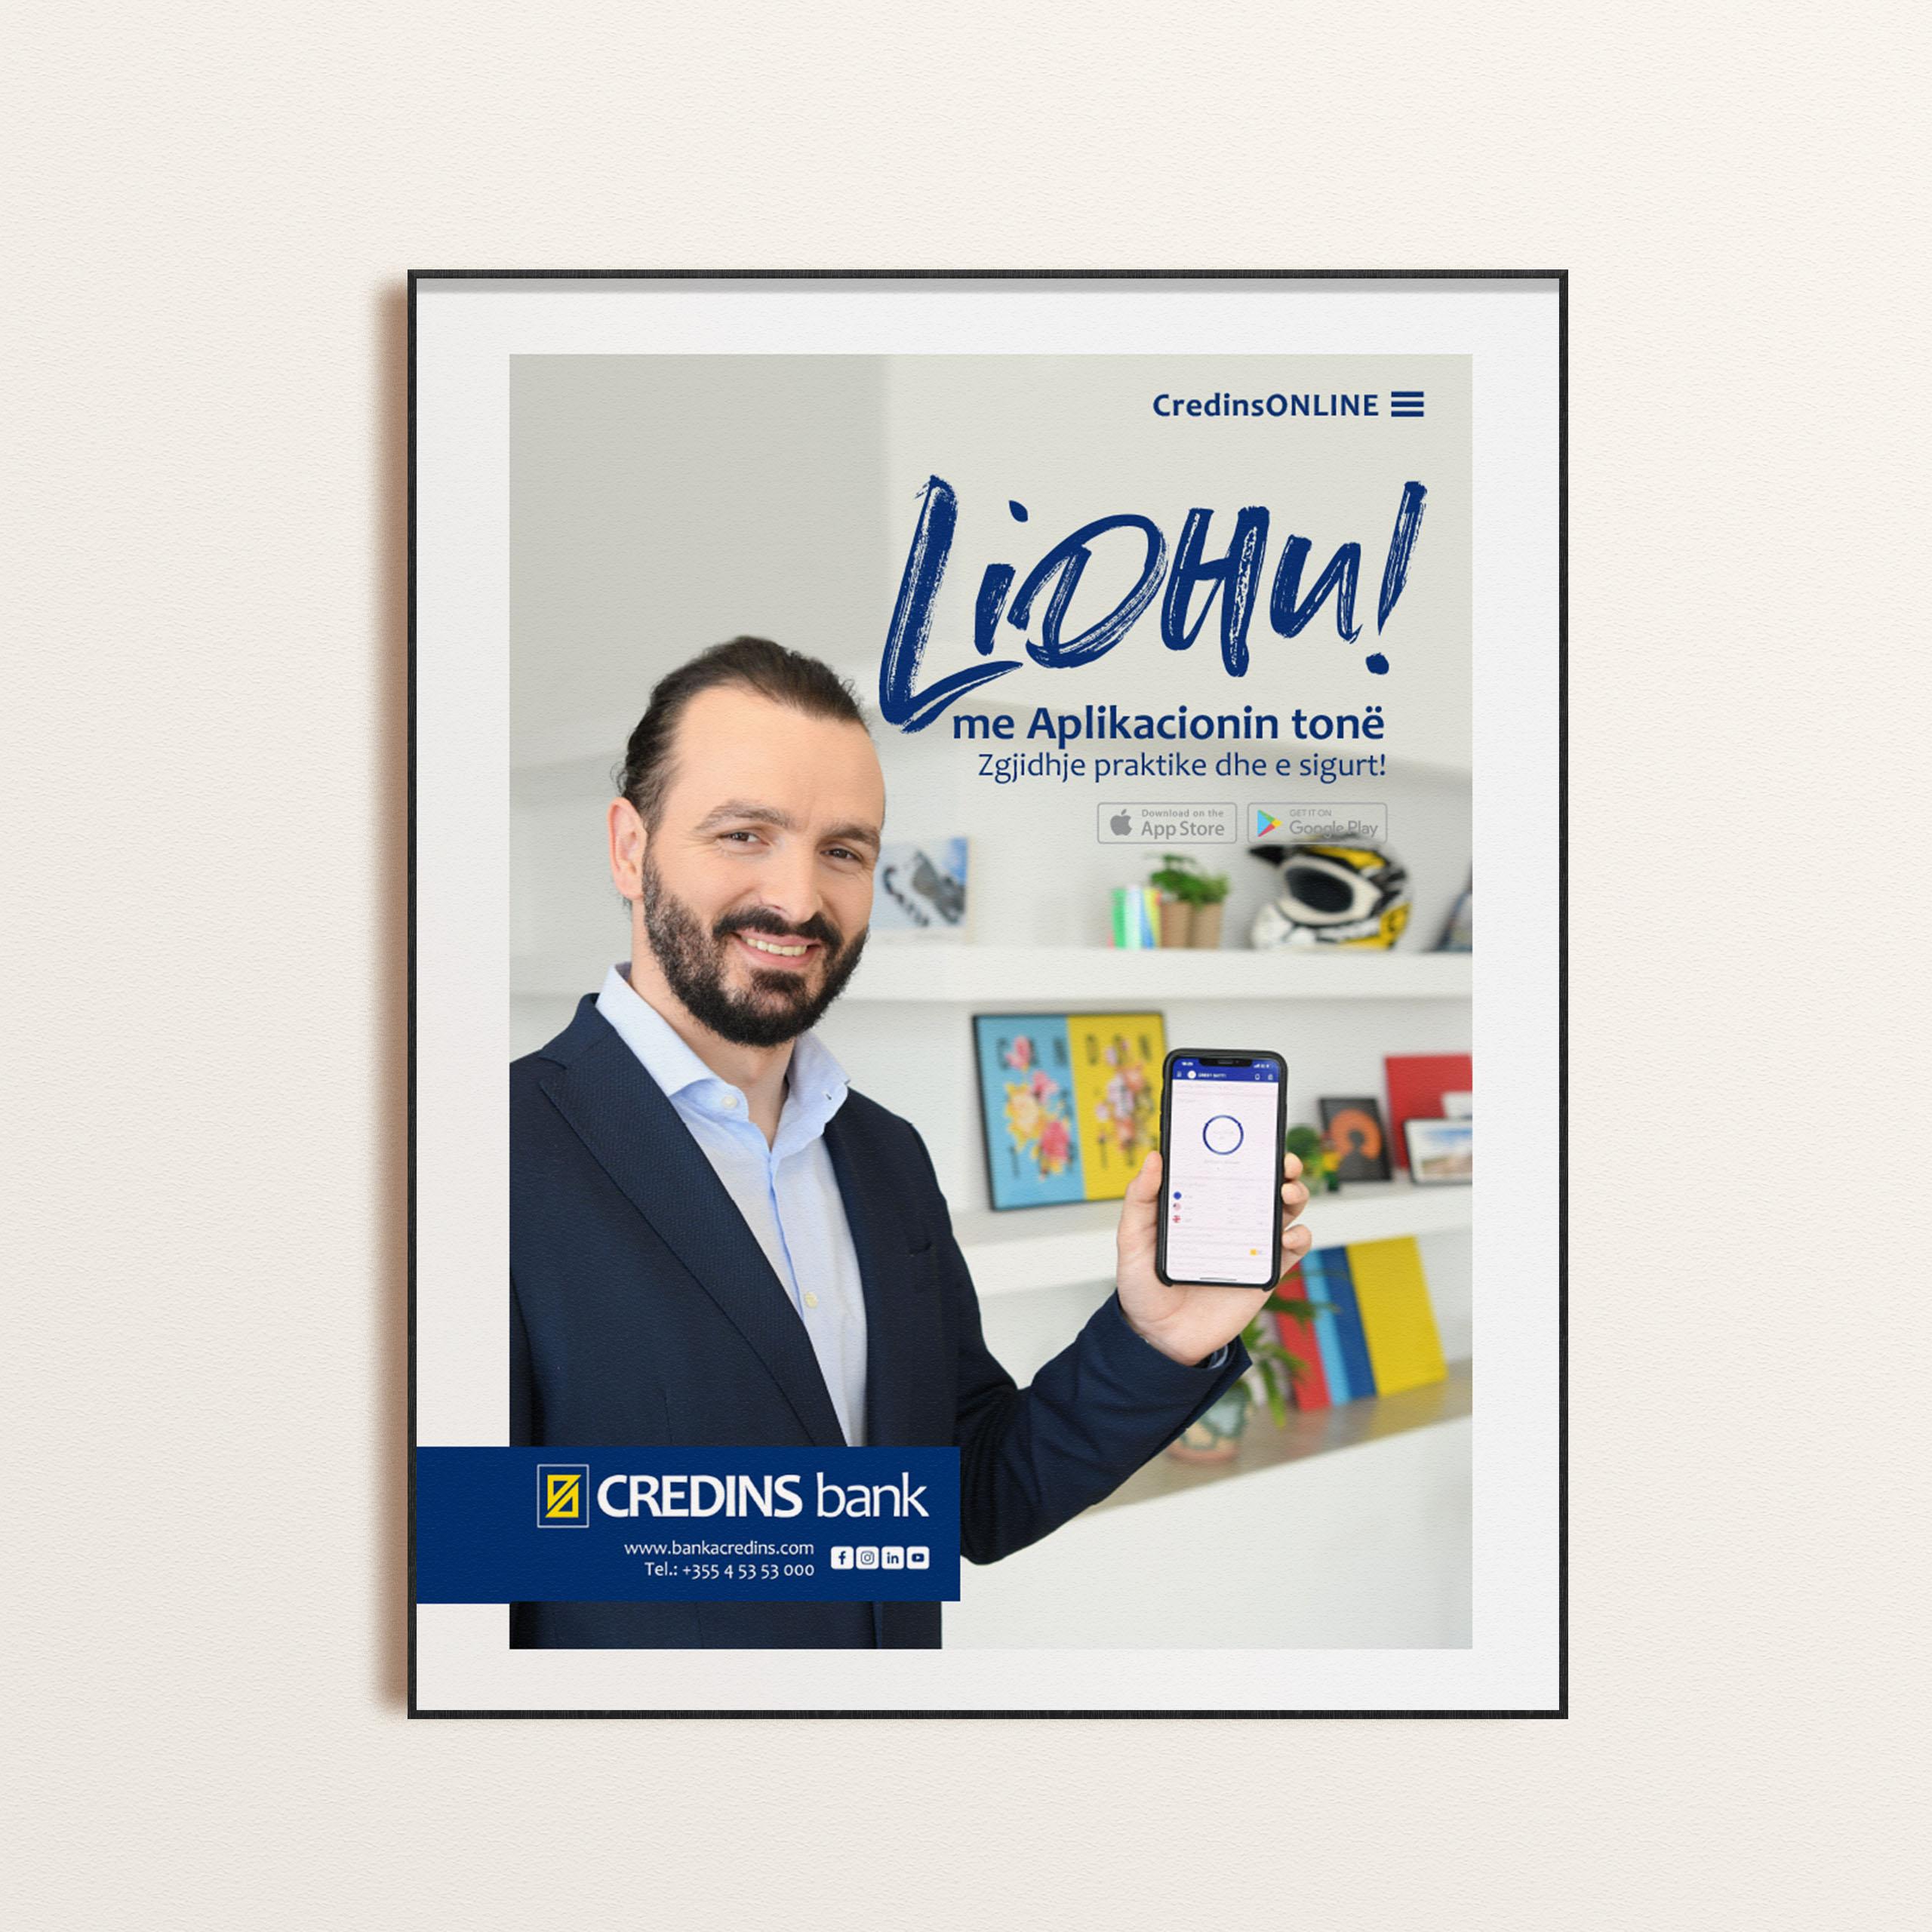 Credins Bank Project Img 5 - Vatra Agency / Founder & CEO Gerton Bejo